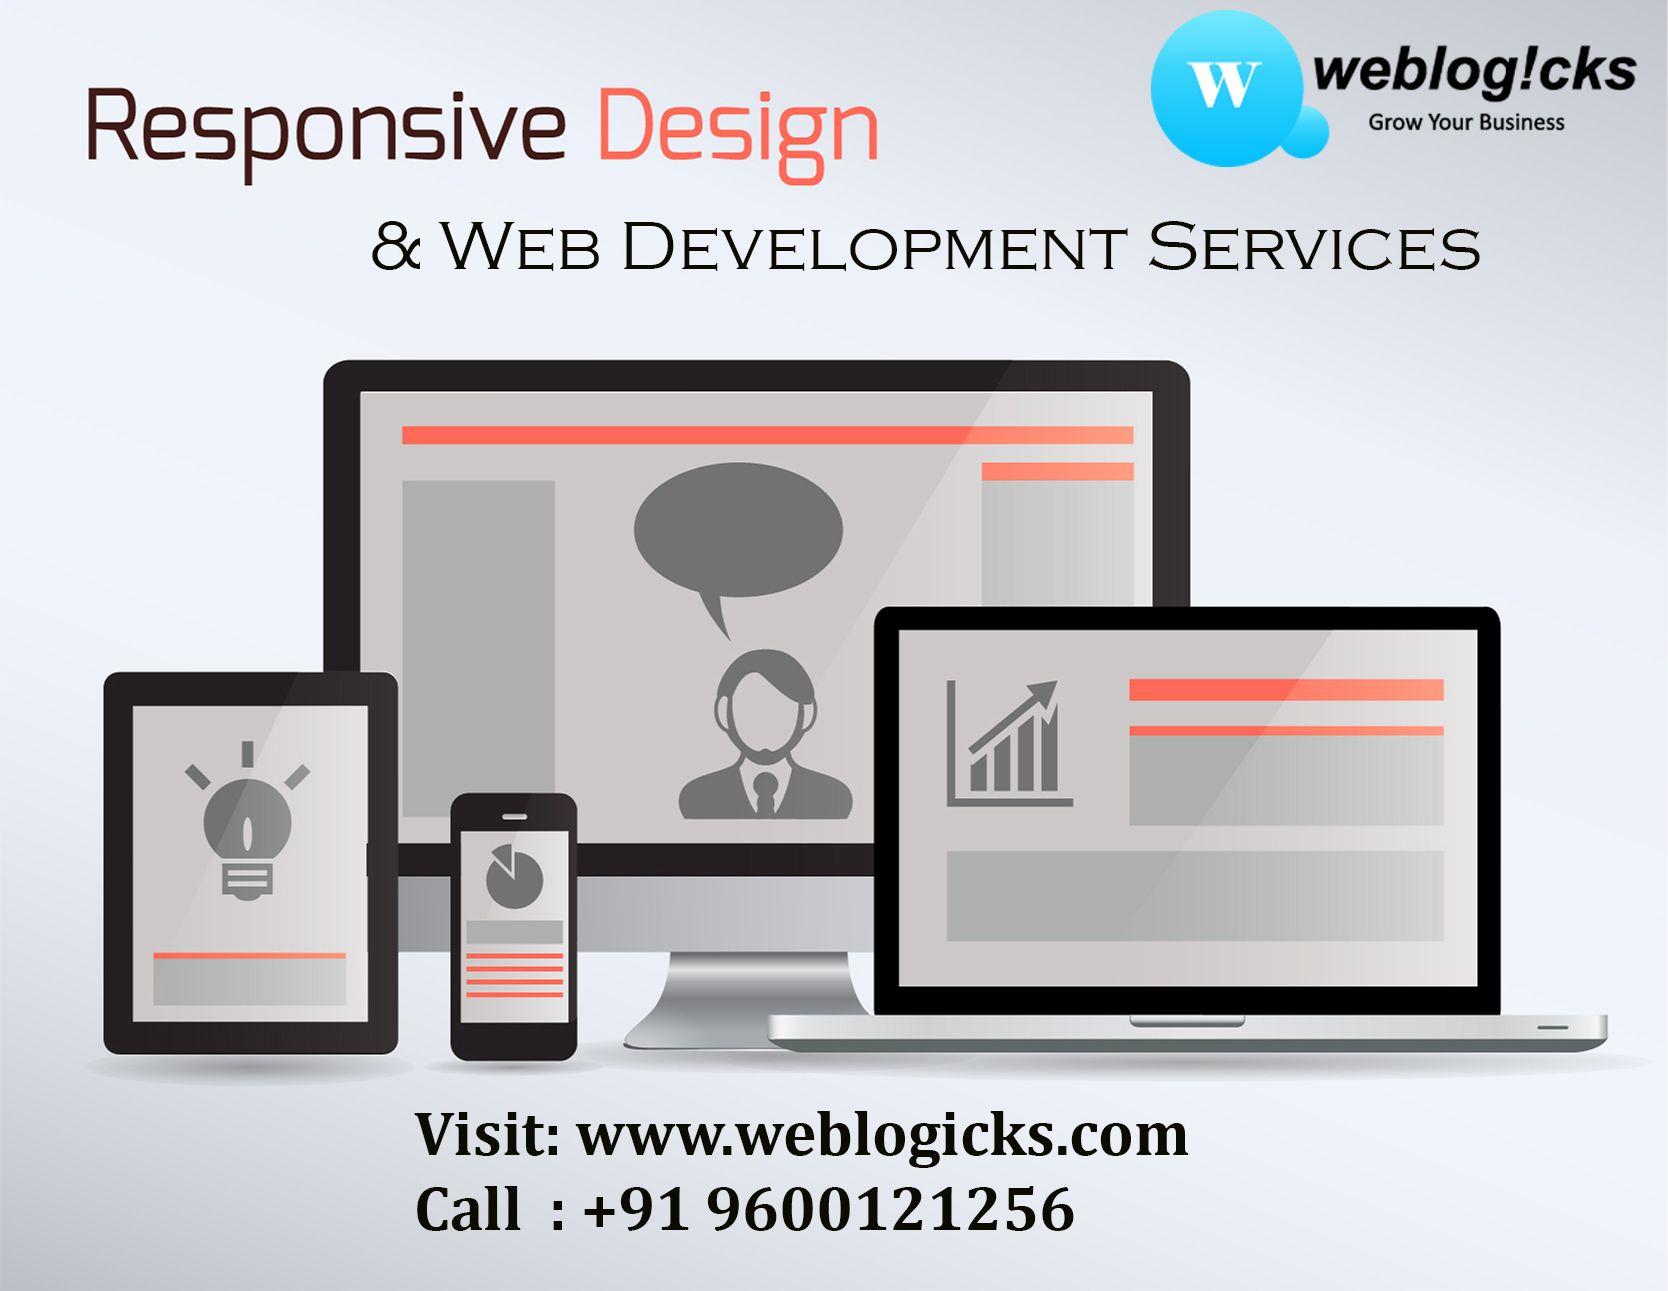 Best SEO Services in Bangalore - Weblogicks.com